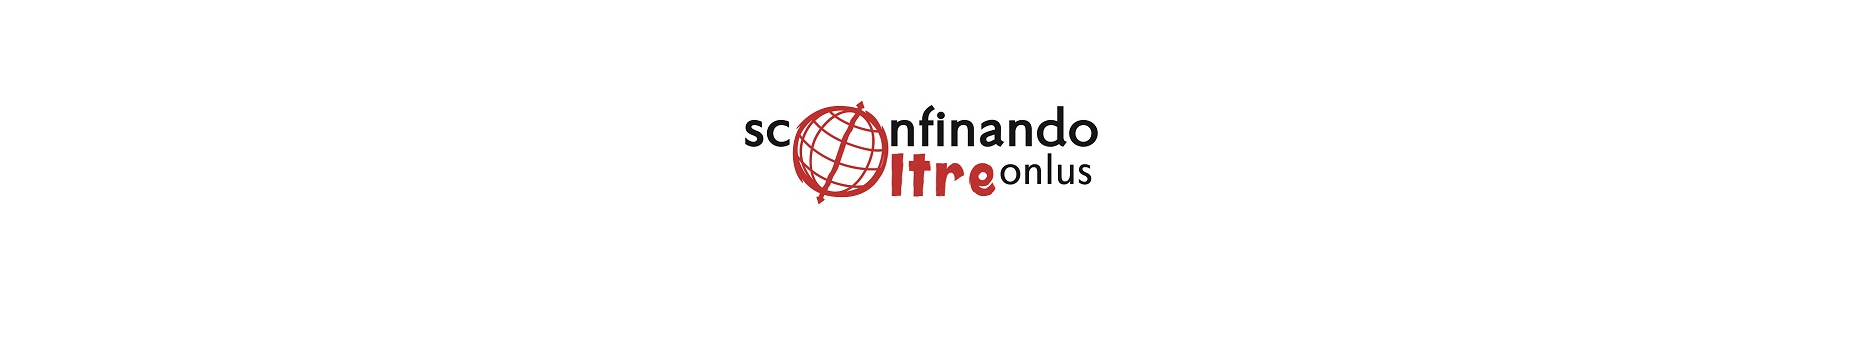 associazione sconfinando logo